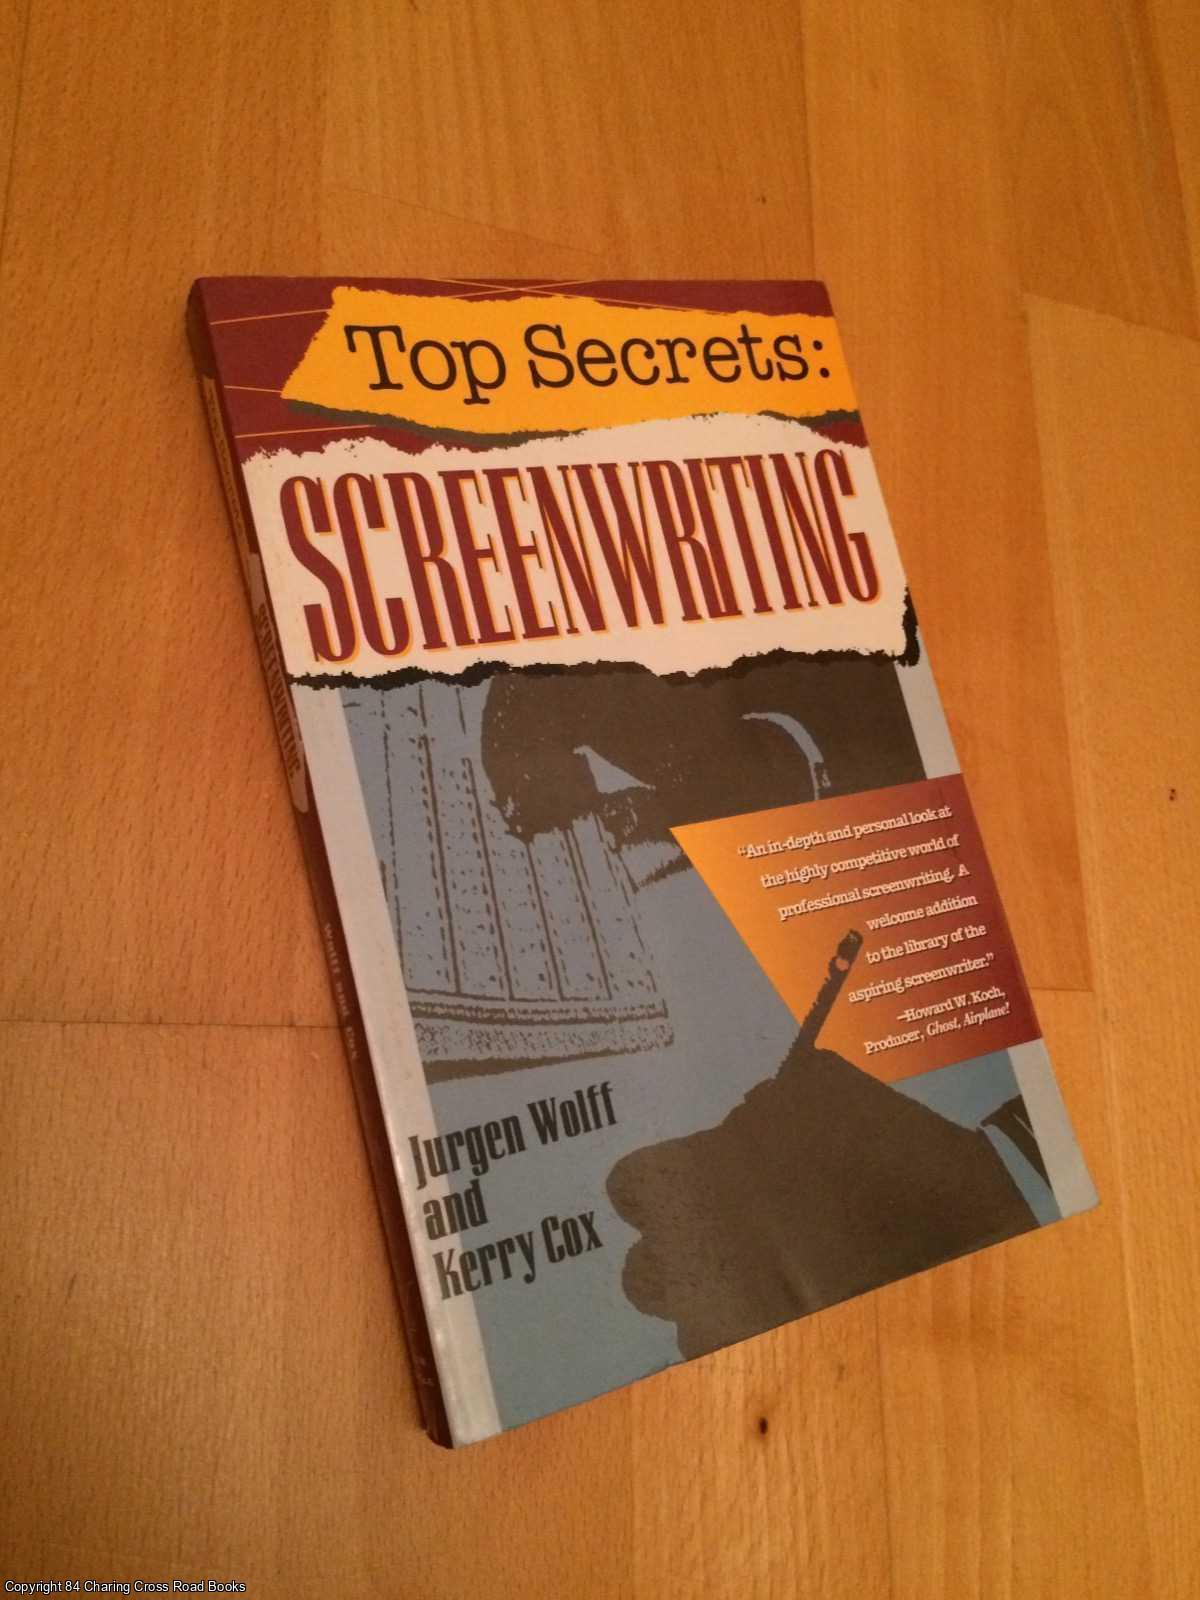 COX, KERRY, WOLFF, JURGEN - Top Secrets: Screenwriting